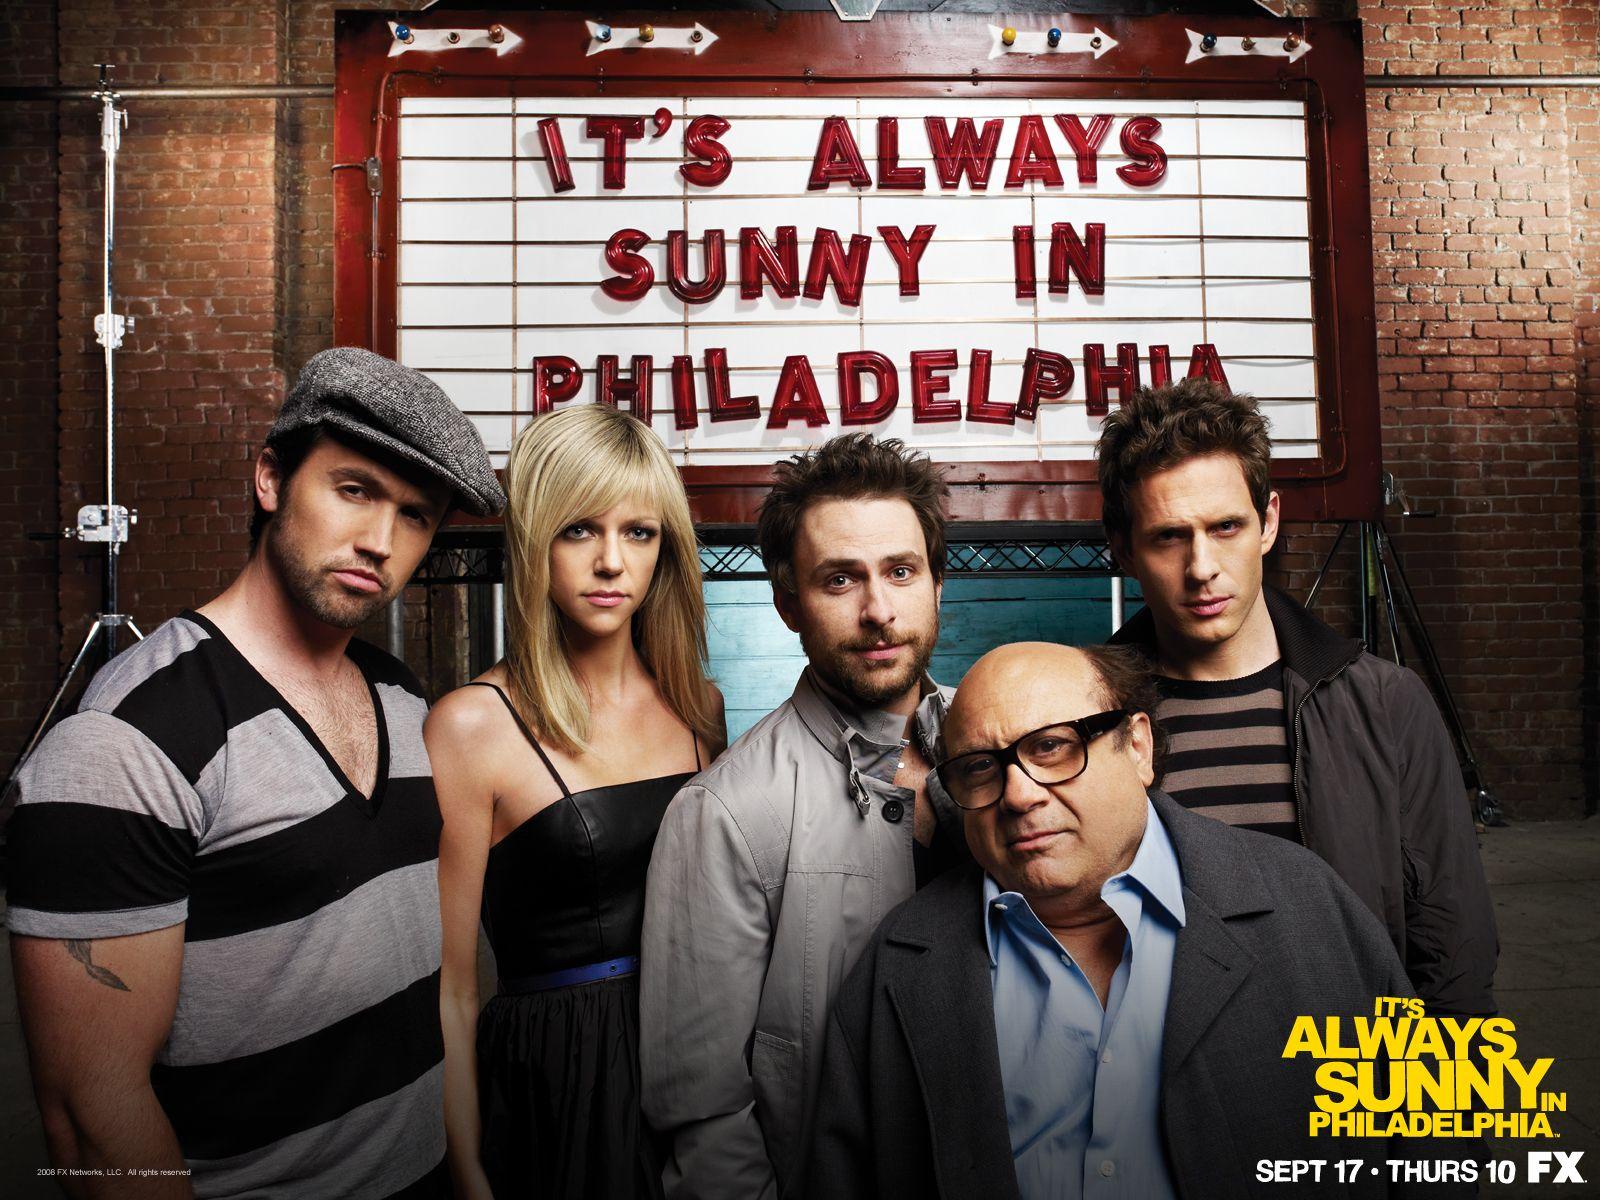 It S Always Sunny In Philadelphia With Images It S Always Sunny In Philadelphia Sunny In Philadelphia It S Always Sunny